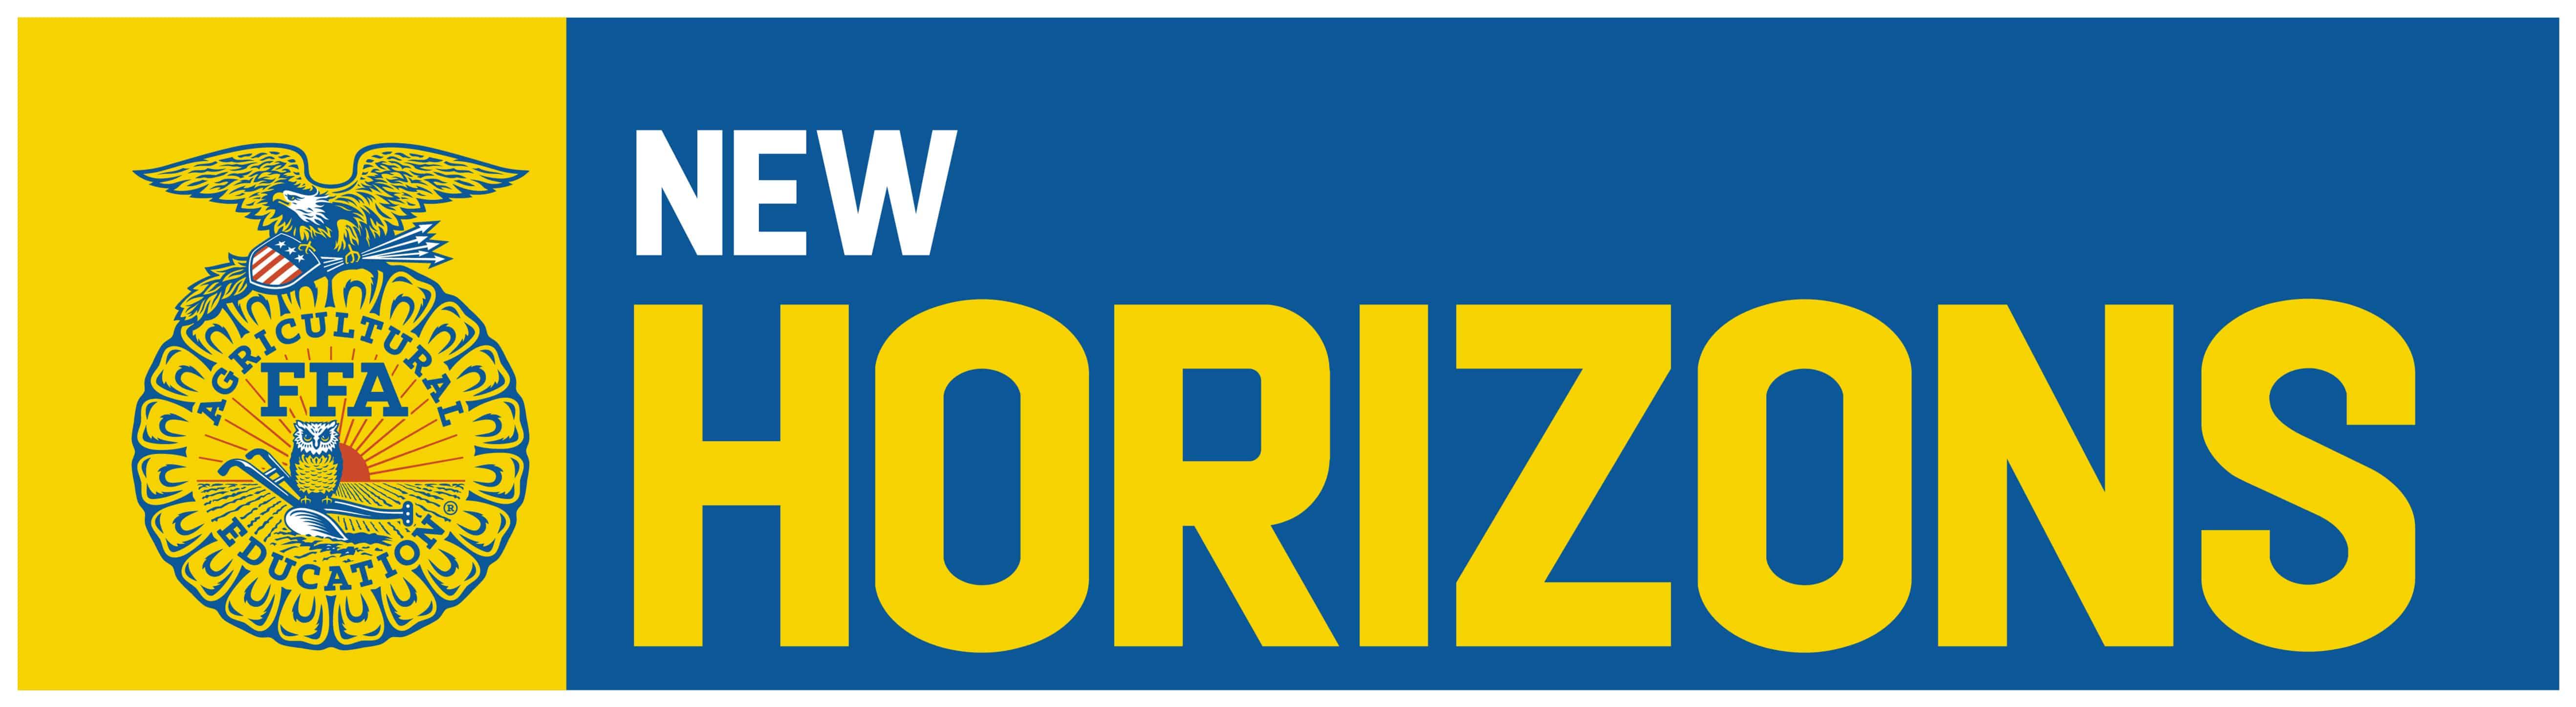 FFA New Horizons Logo 1989